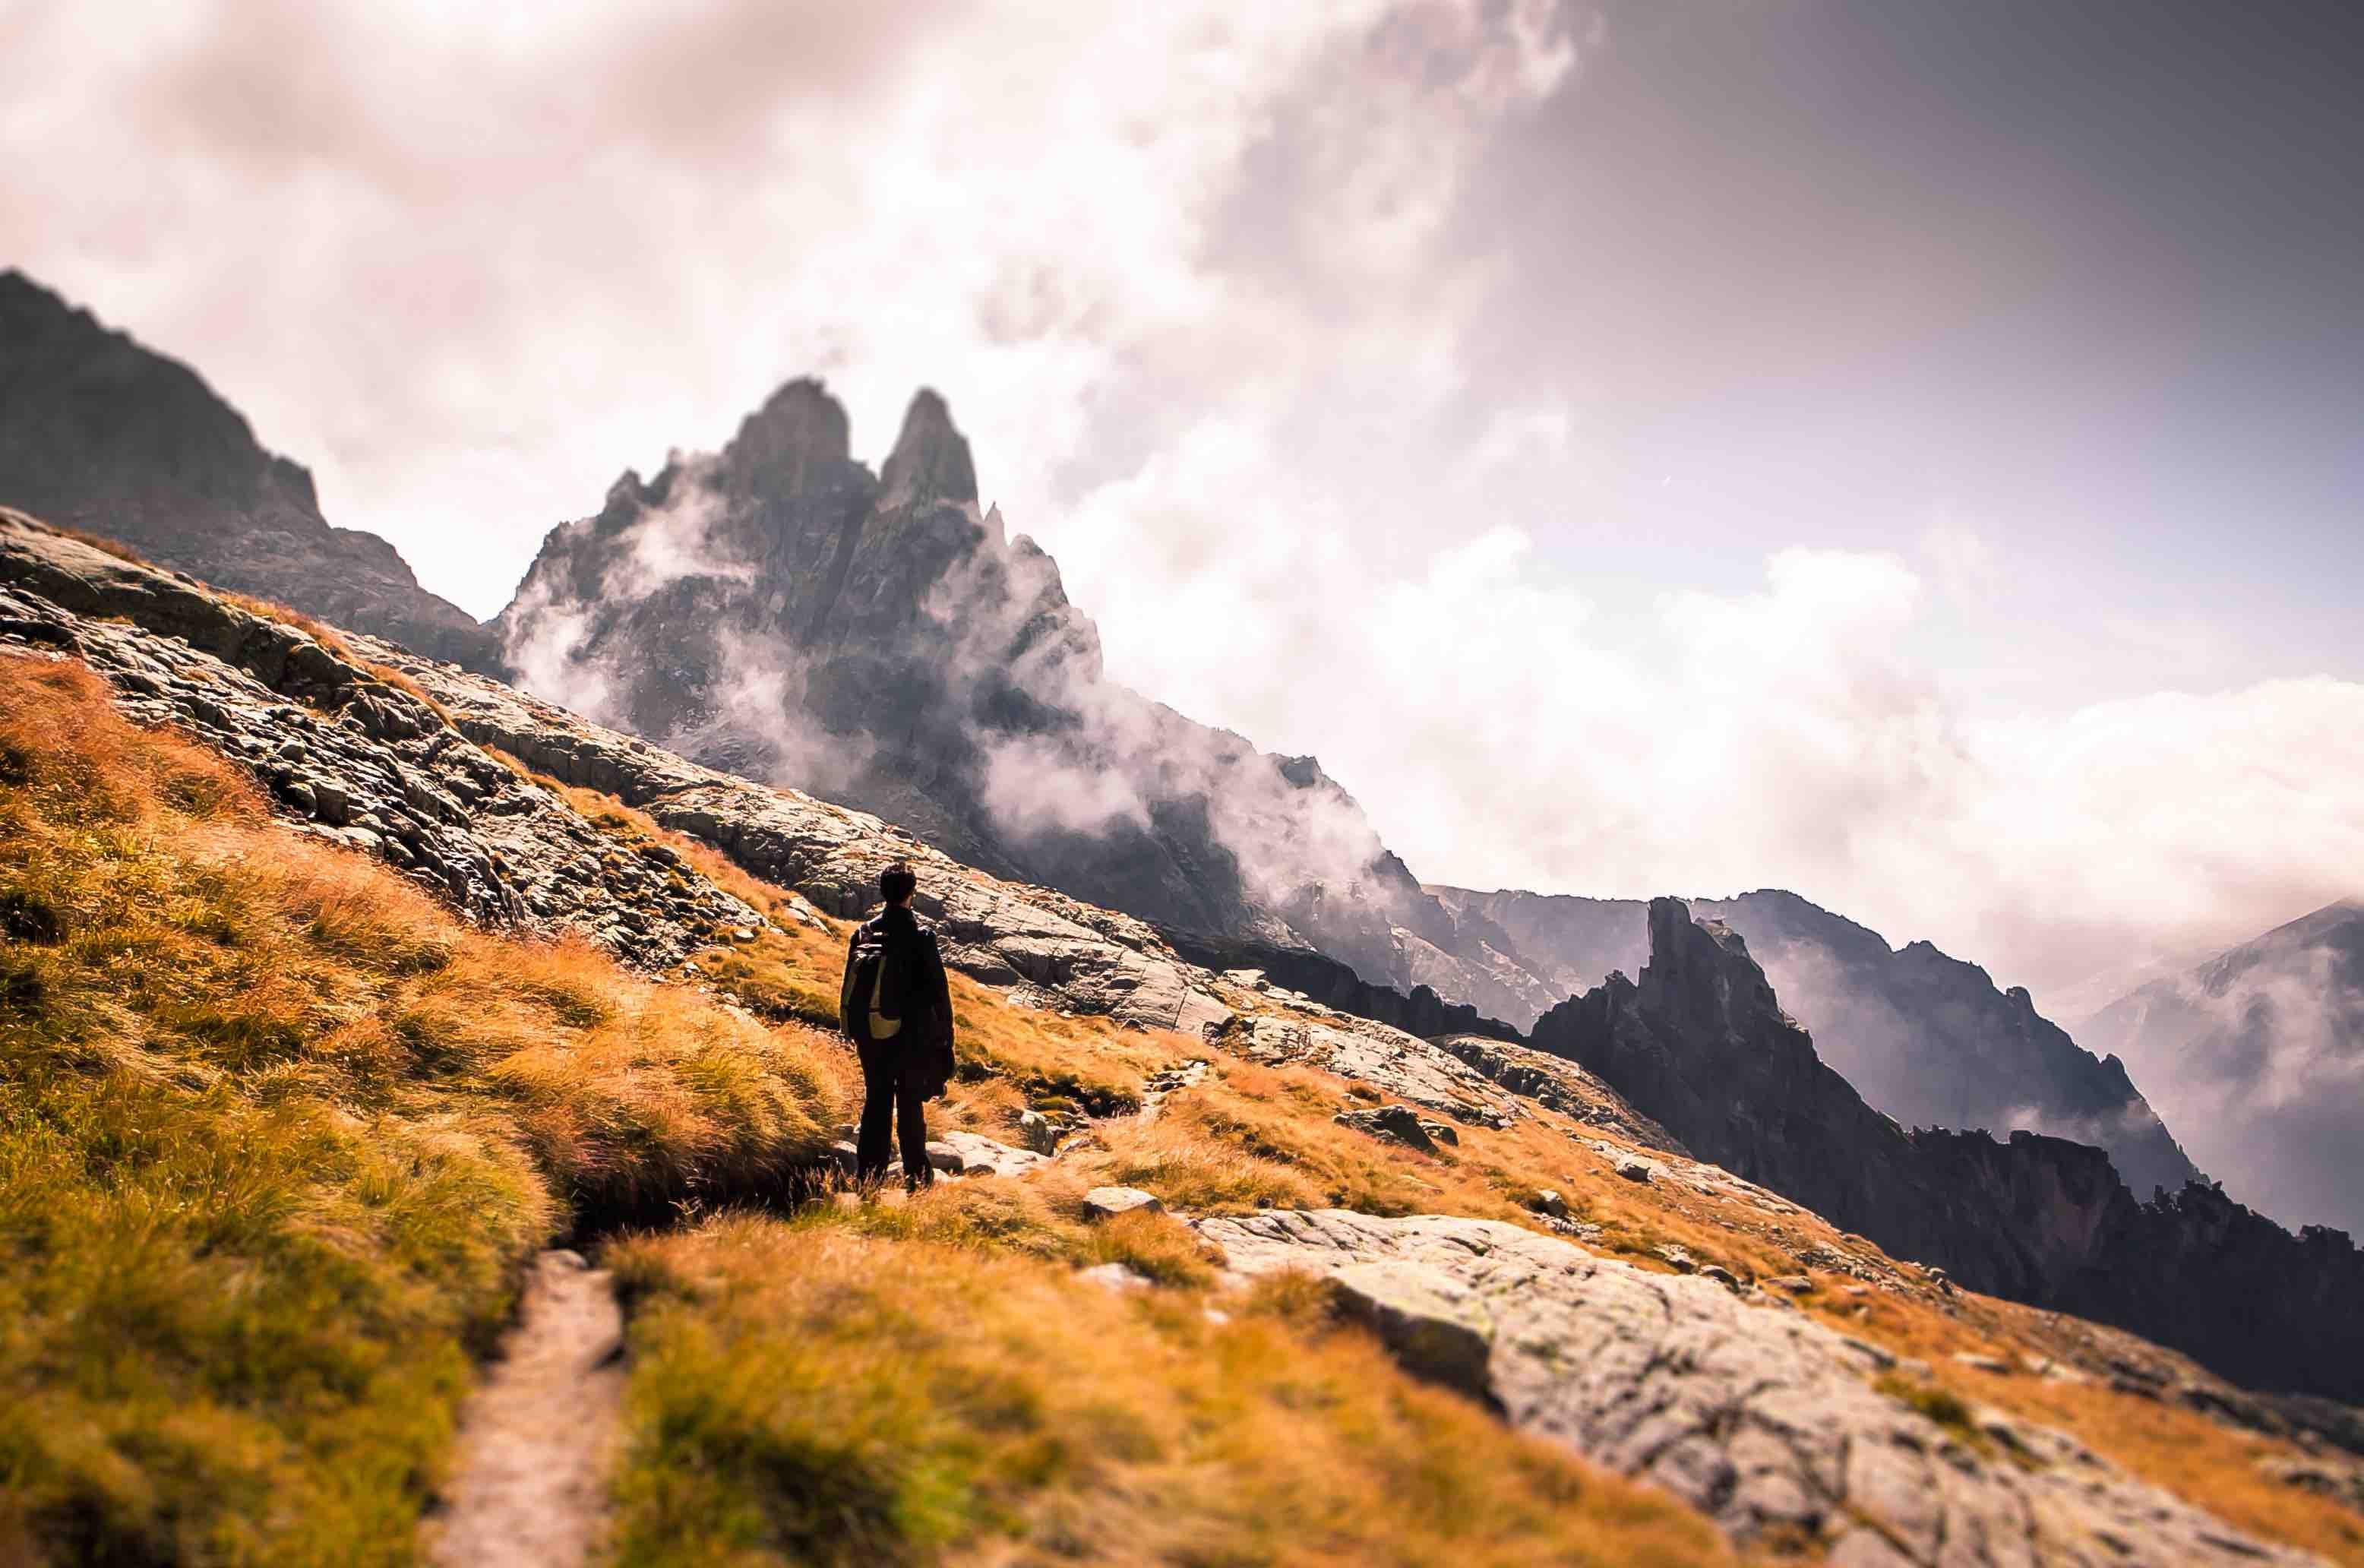 Panorama sentiero cime creste - StoryTravelers